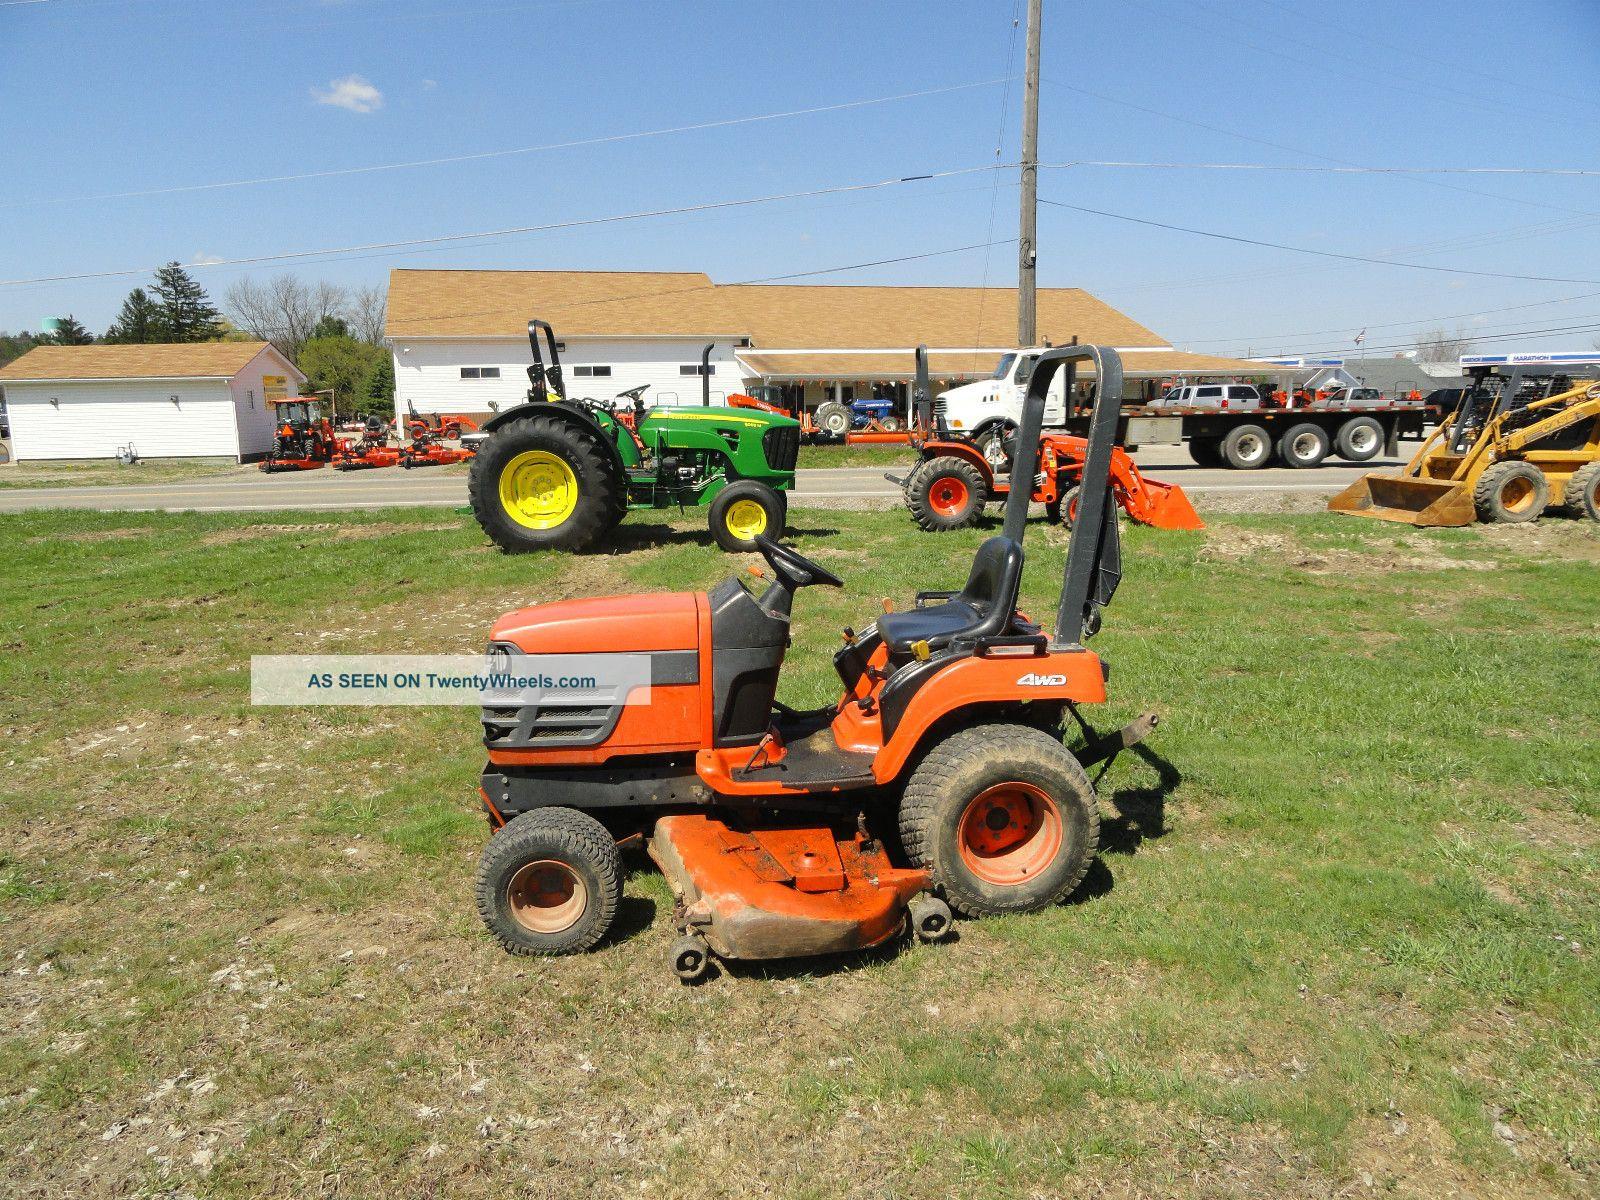 Kubota Bx2200d - 60,  Kubota Bx Tractor,  Bx2200d,  Bx2200d - 60,  Sub - Compact Tractor Tractors photo